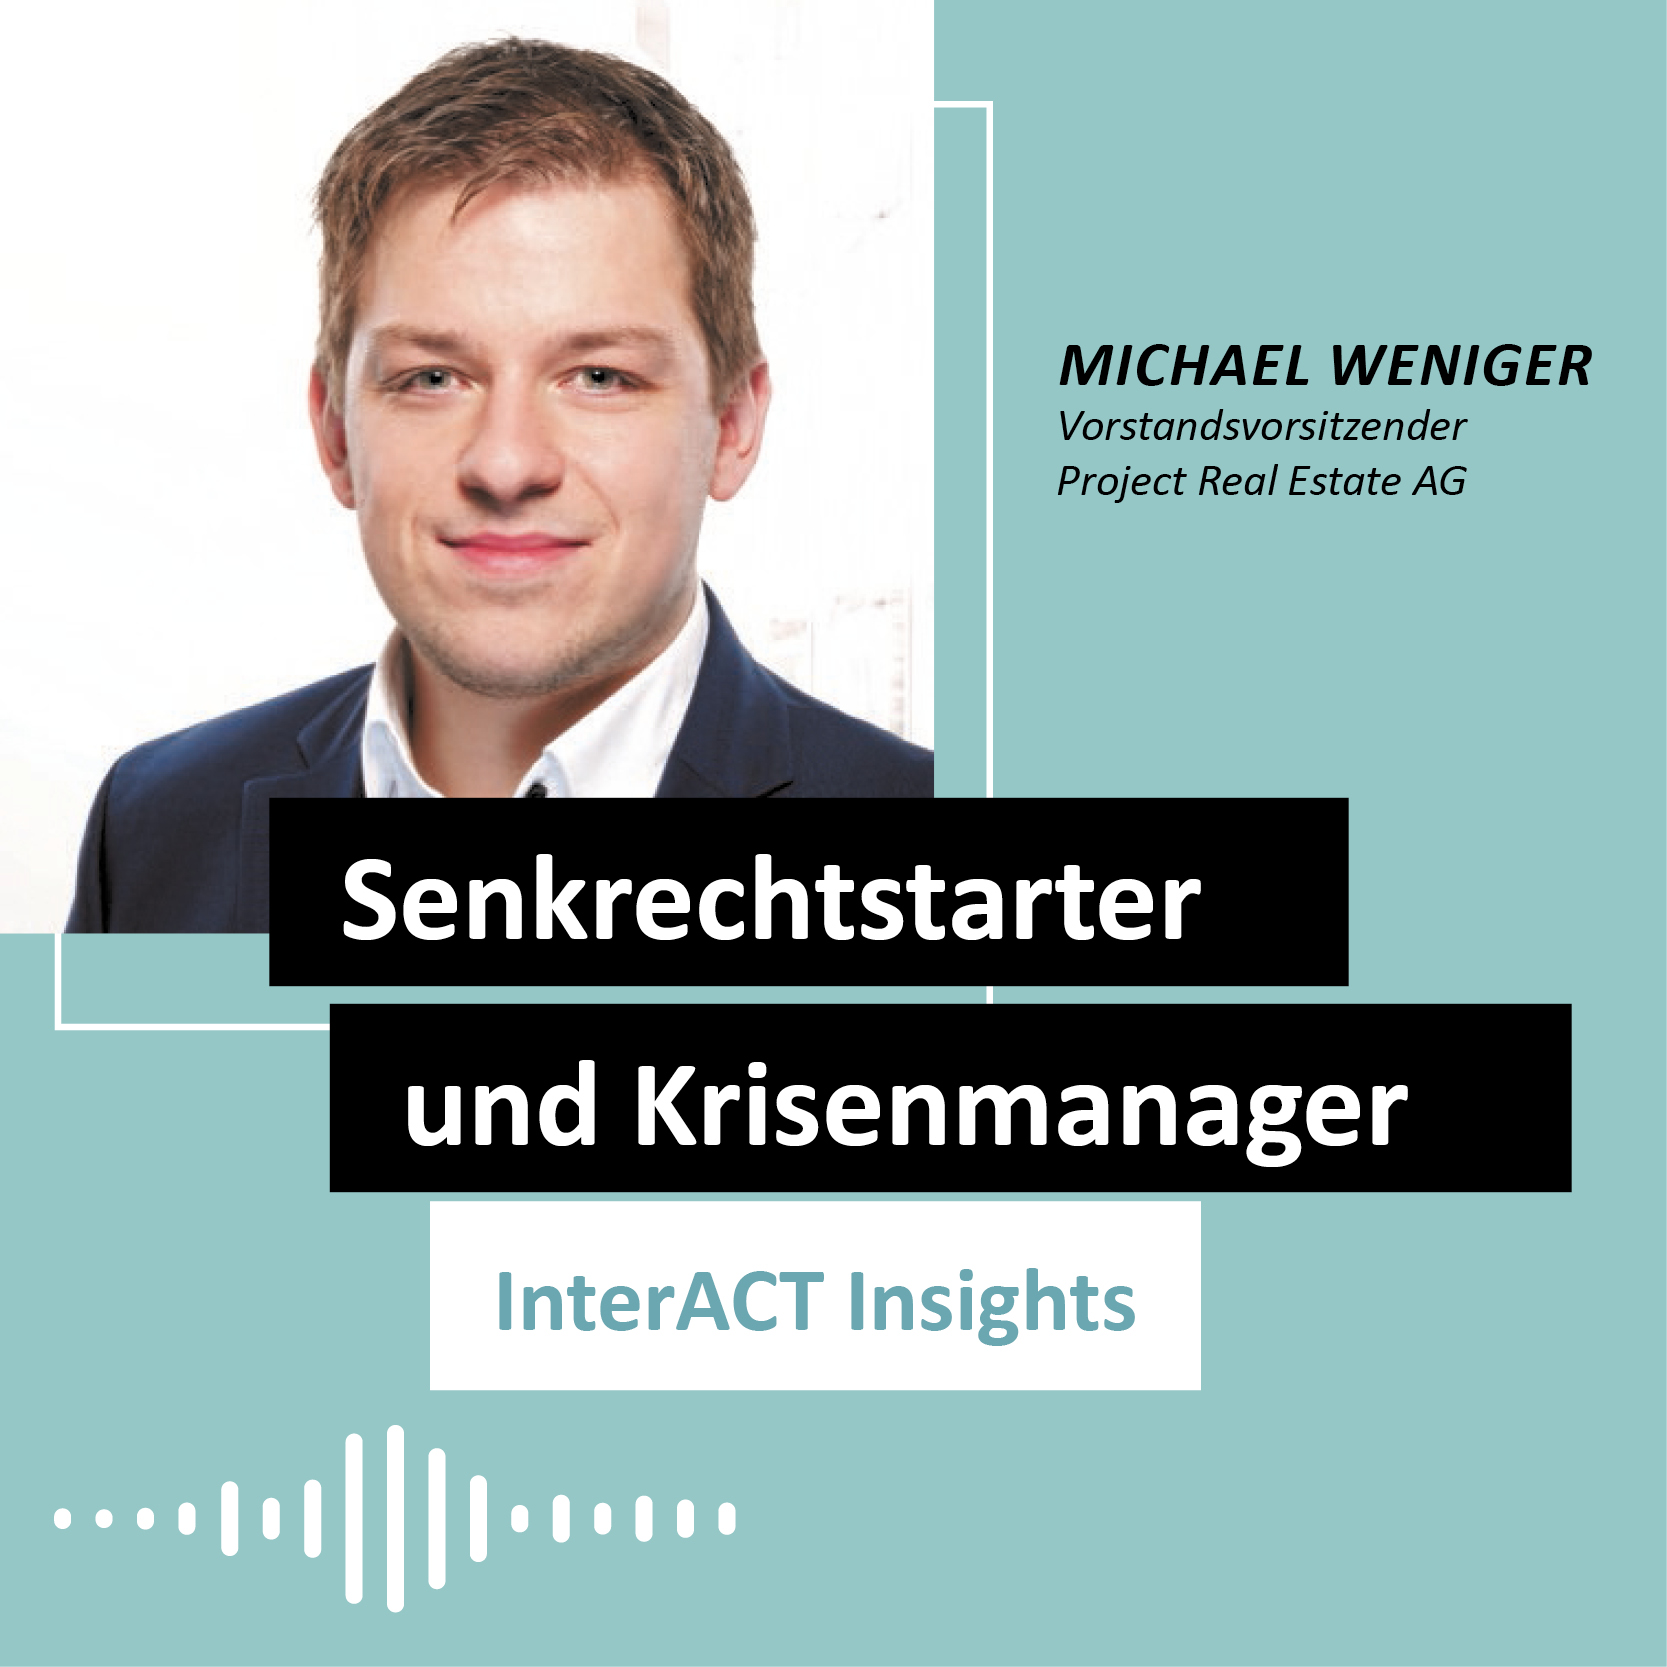 Michael Weniger